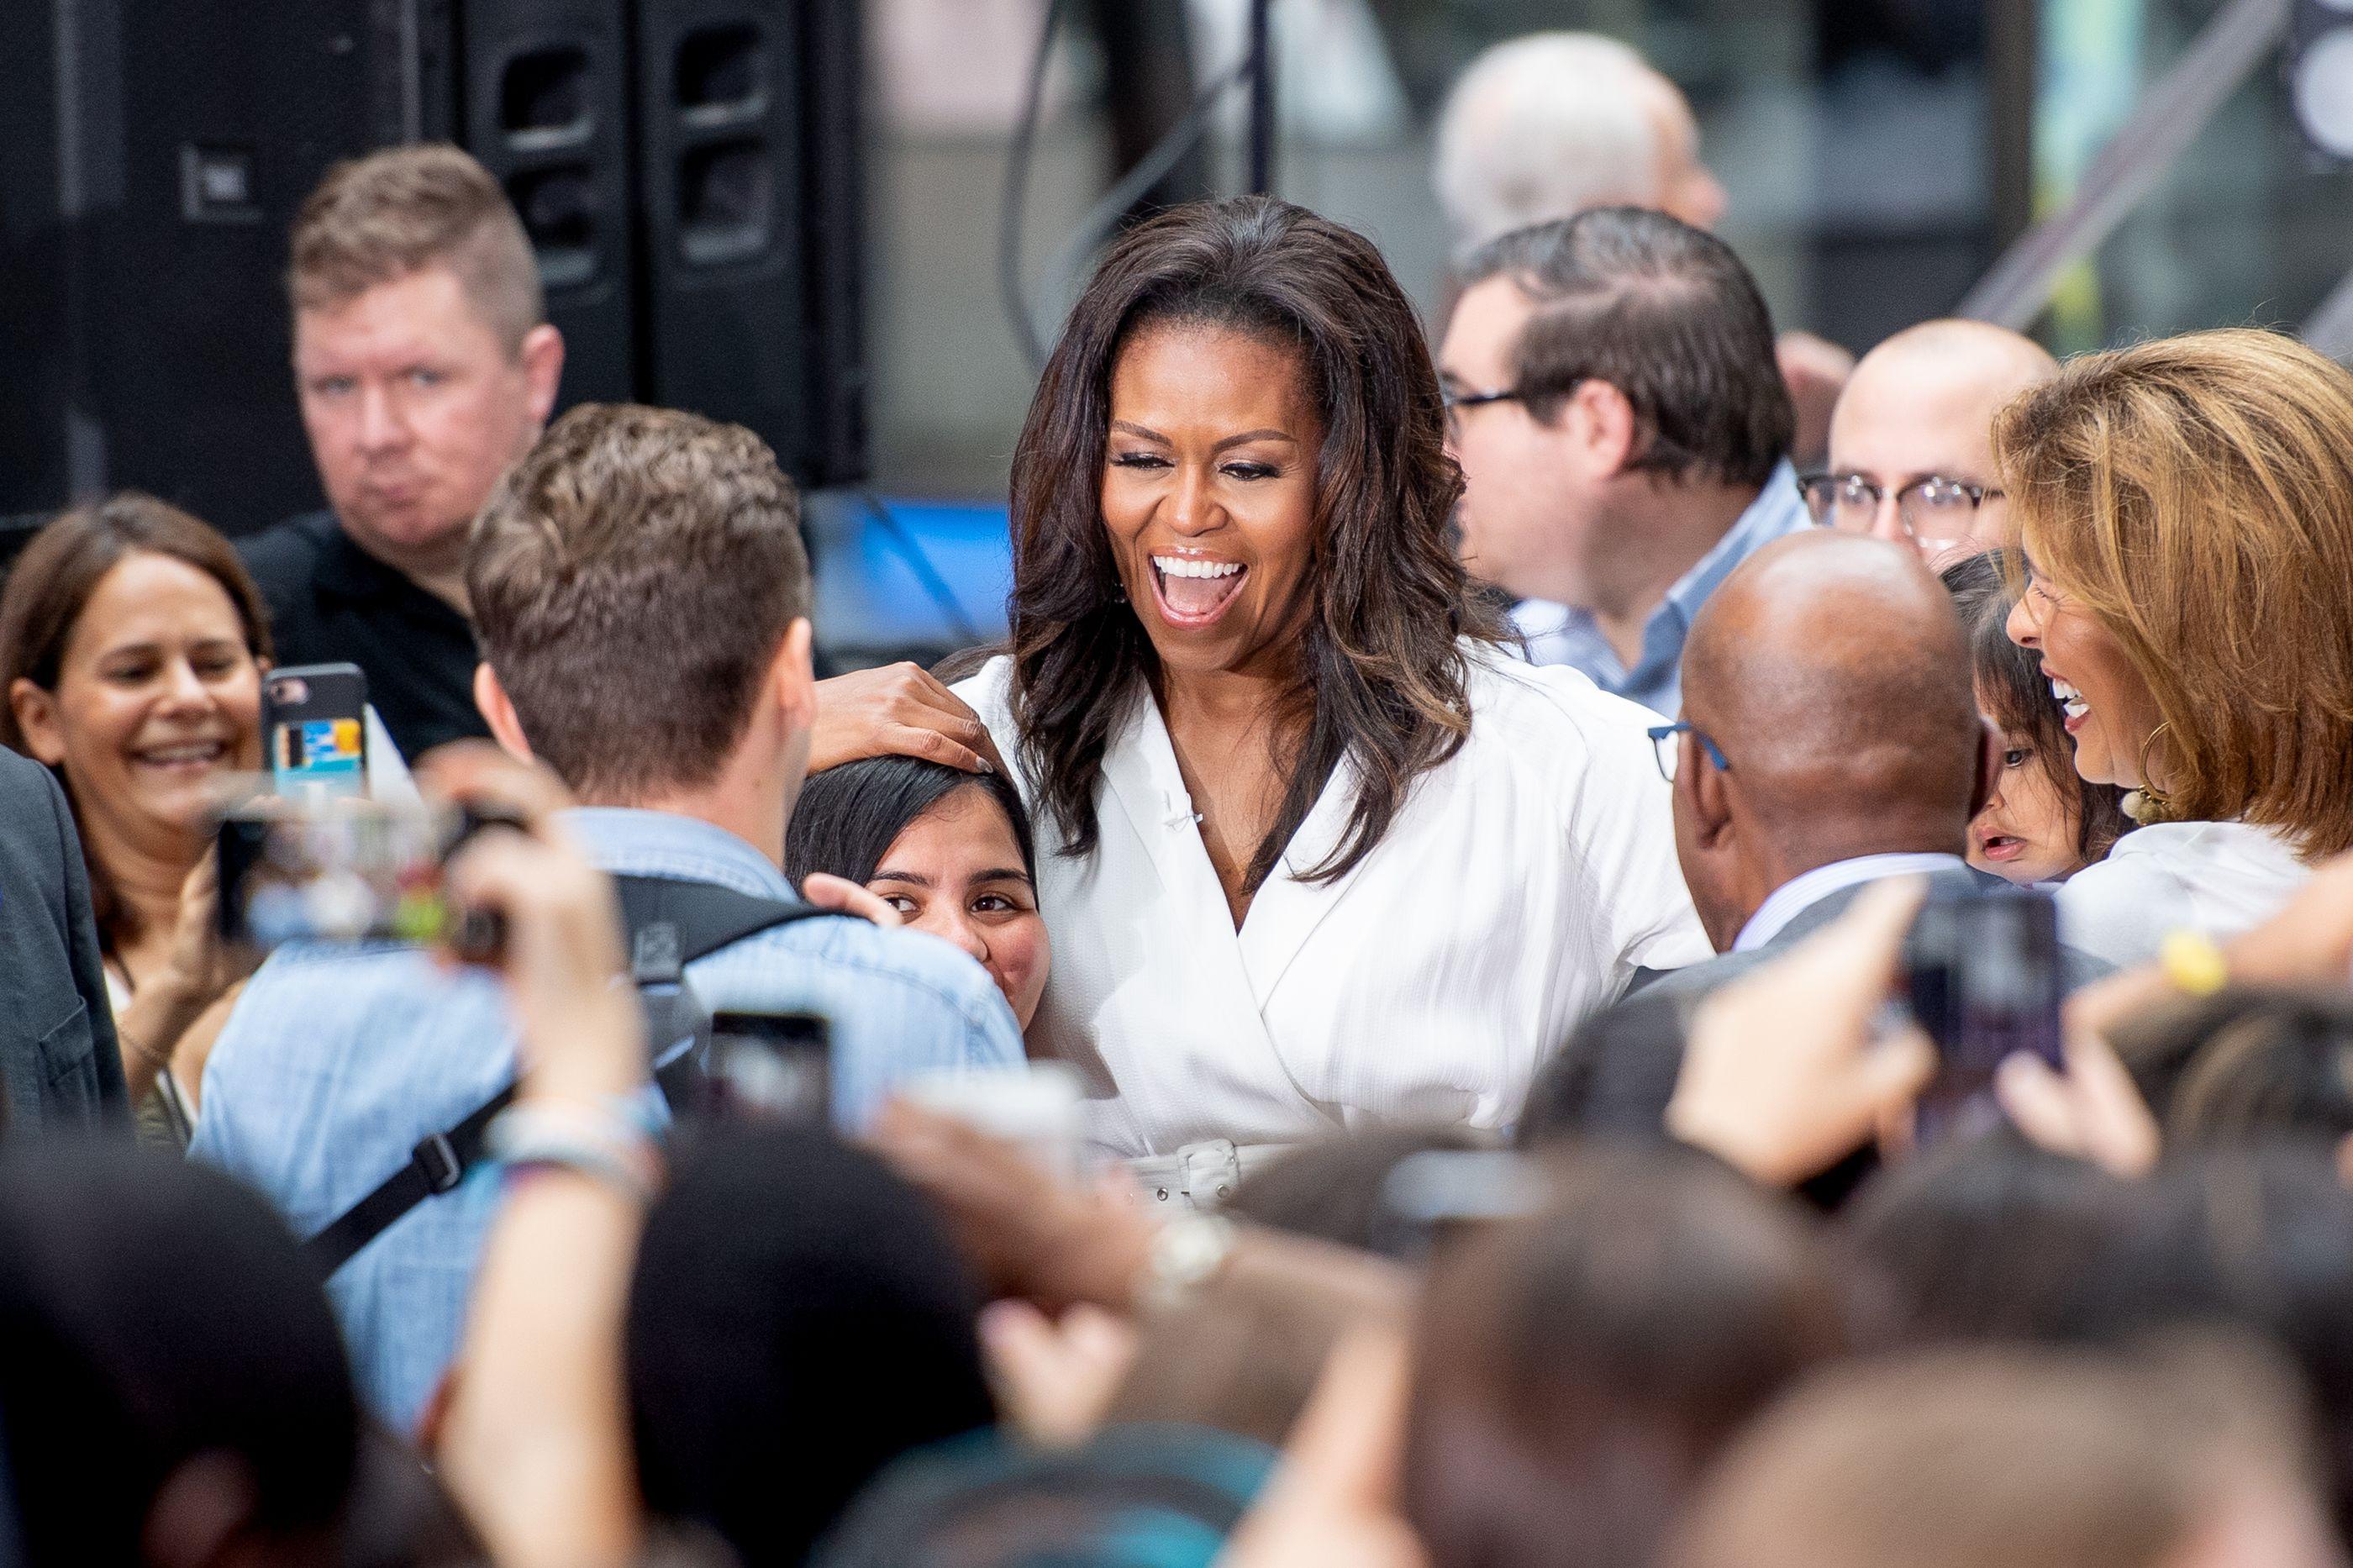 Michelle Obama sofre de 'síndrome do impostor', confessa a própria